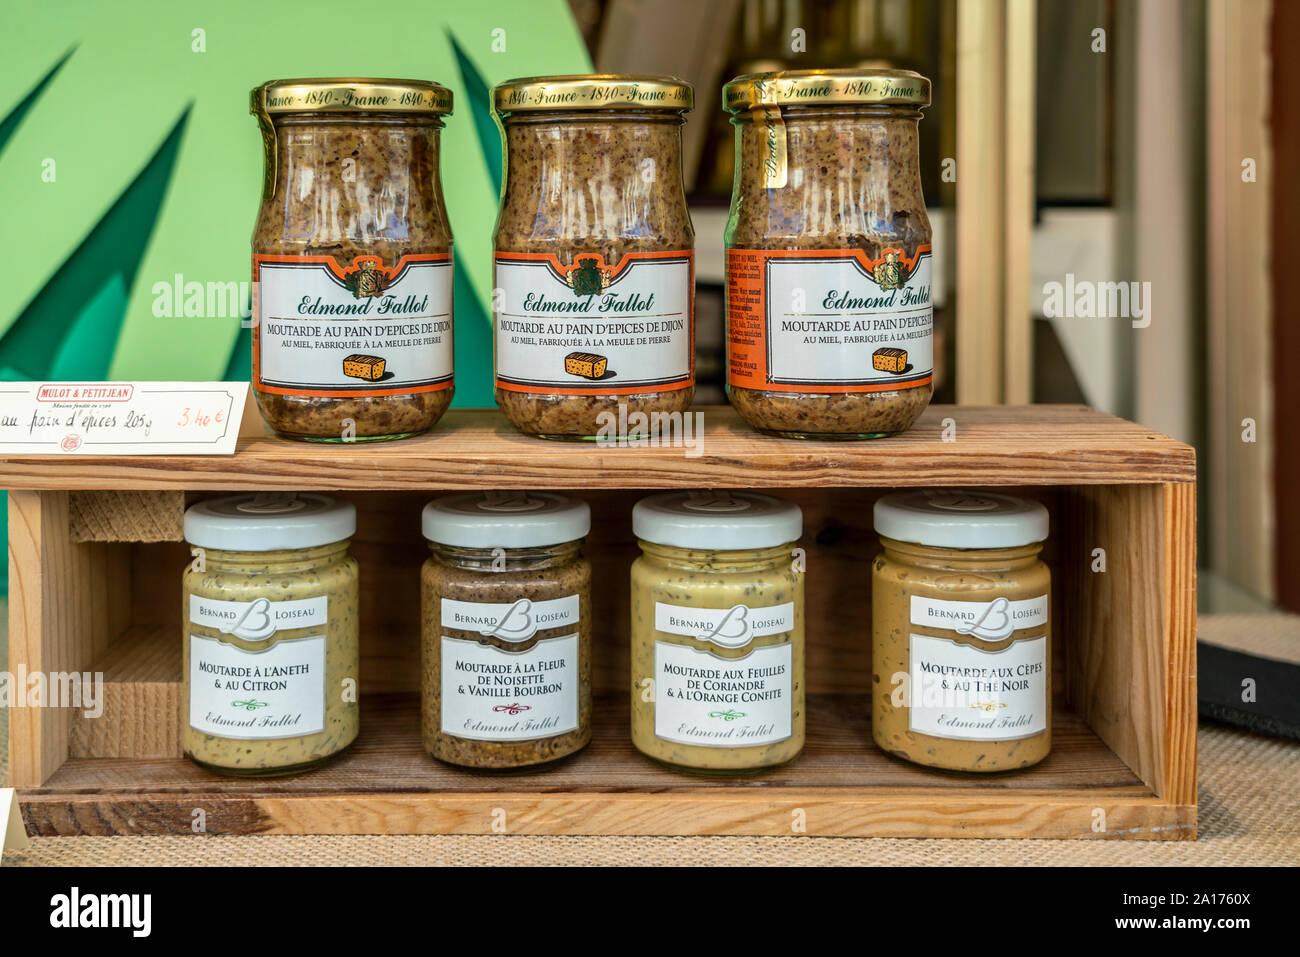 Edmond Fallot mustard, Dijon, Burgundy, France, Stock Photo